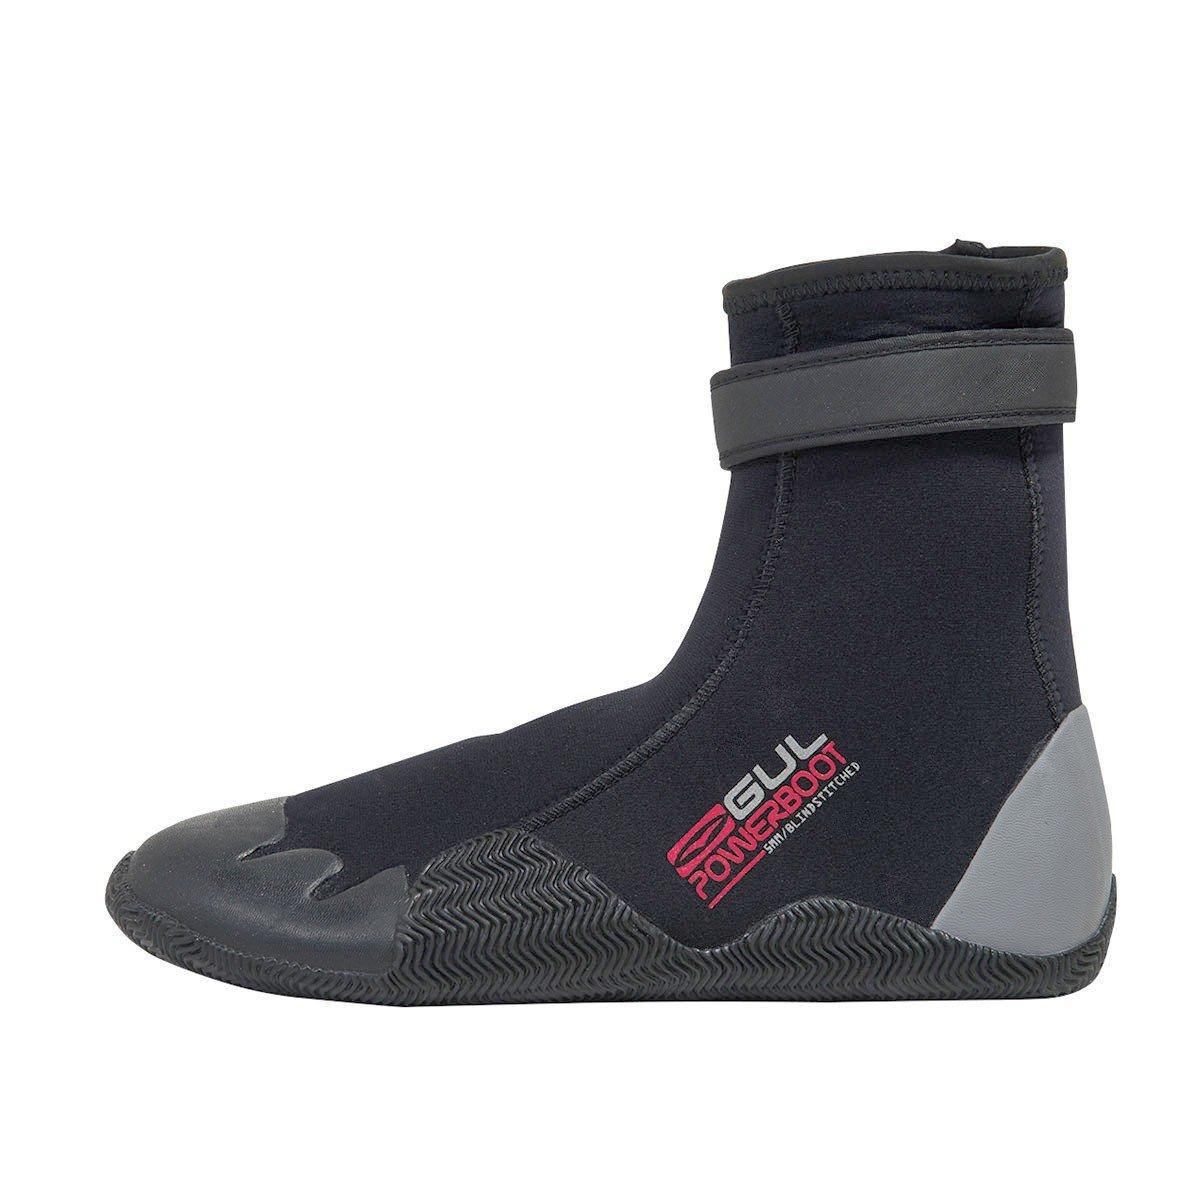 Adults Gul Watersports 5mm Dura-Flex Neoprene Wetsuit Boots